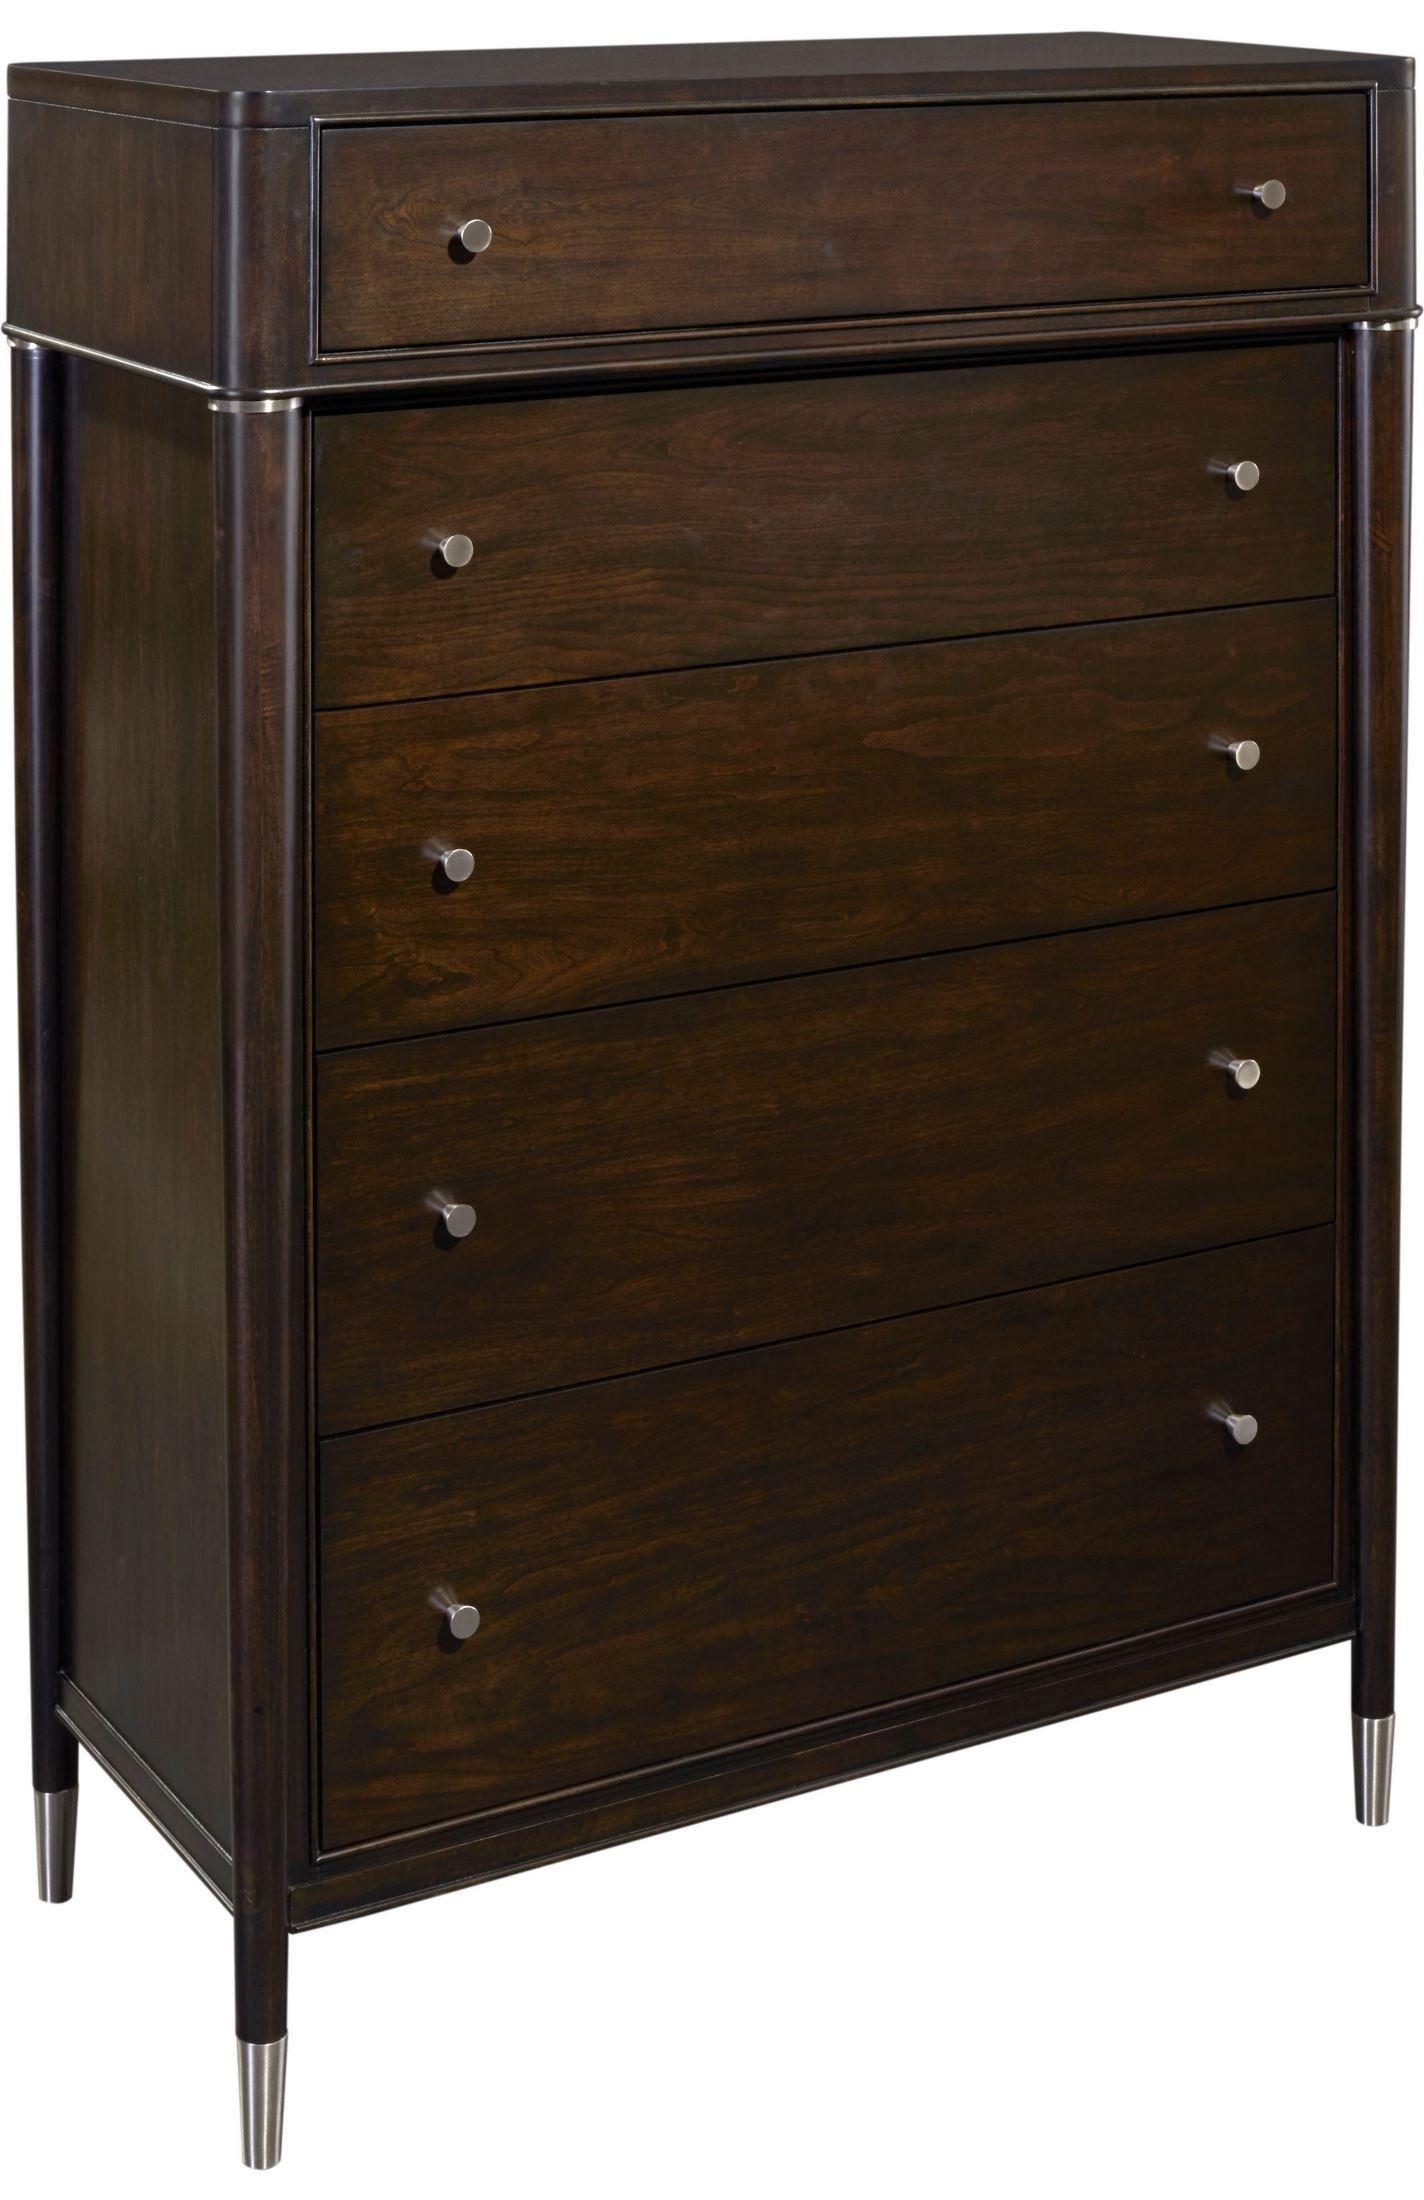 Broyhill Furniture - Vibe Merlot 5 Drawer Chest - 4257-240 ...